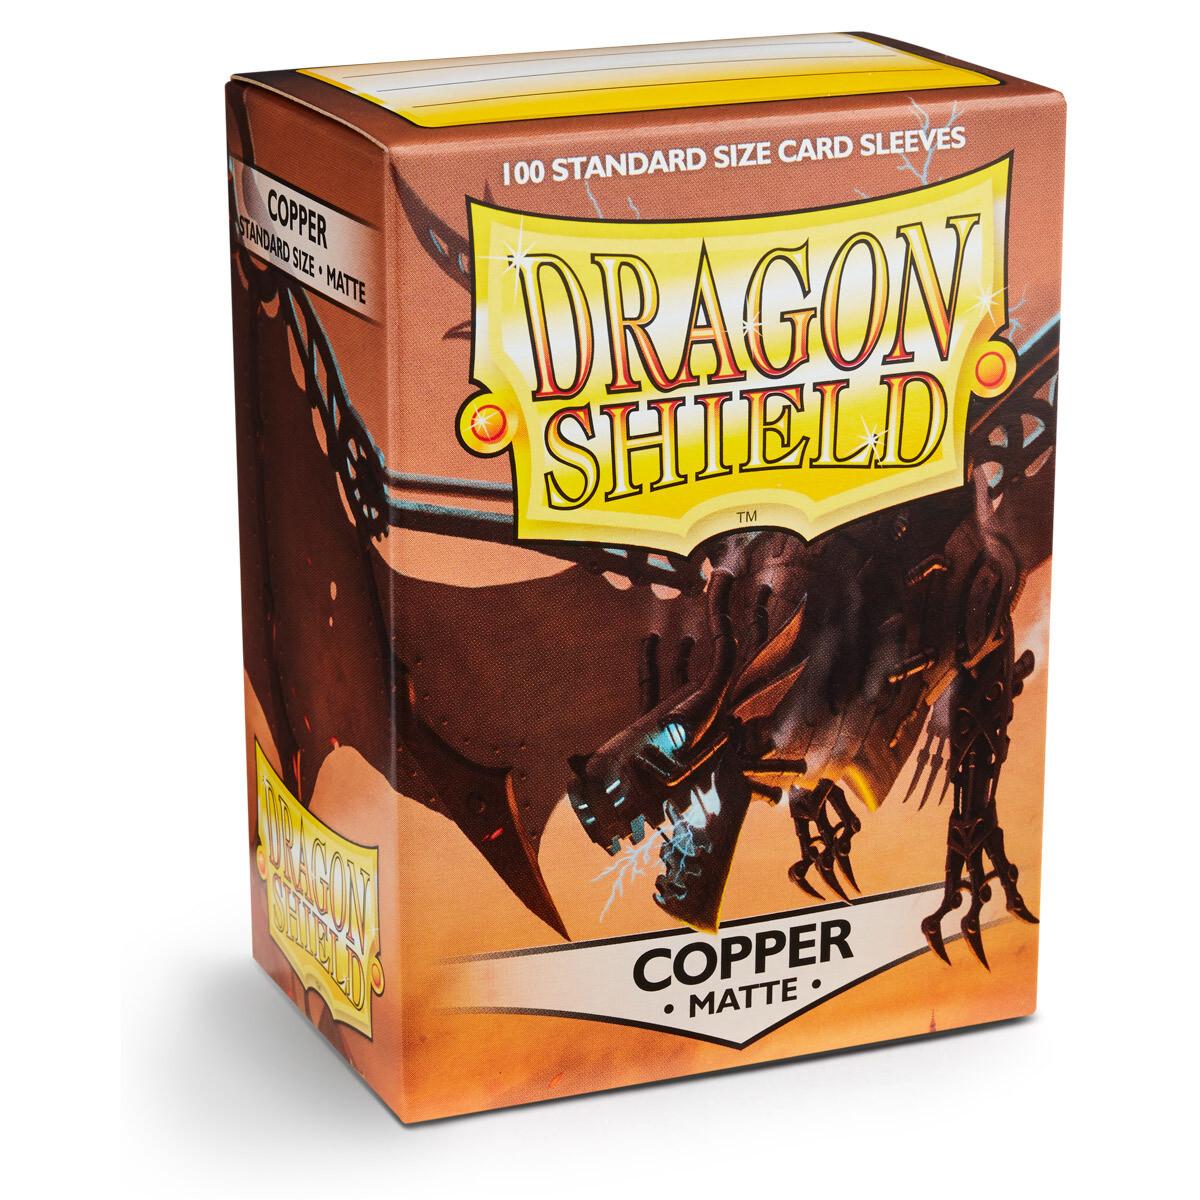 Dragon Shield 100 Sleeves - Matte Copper